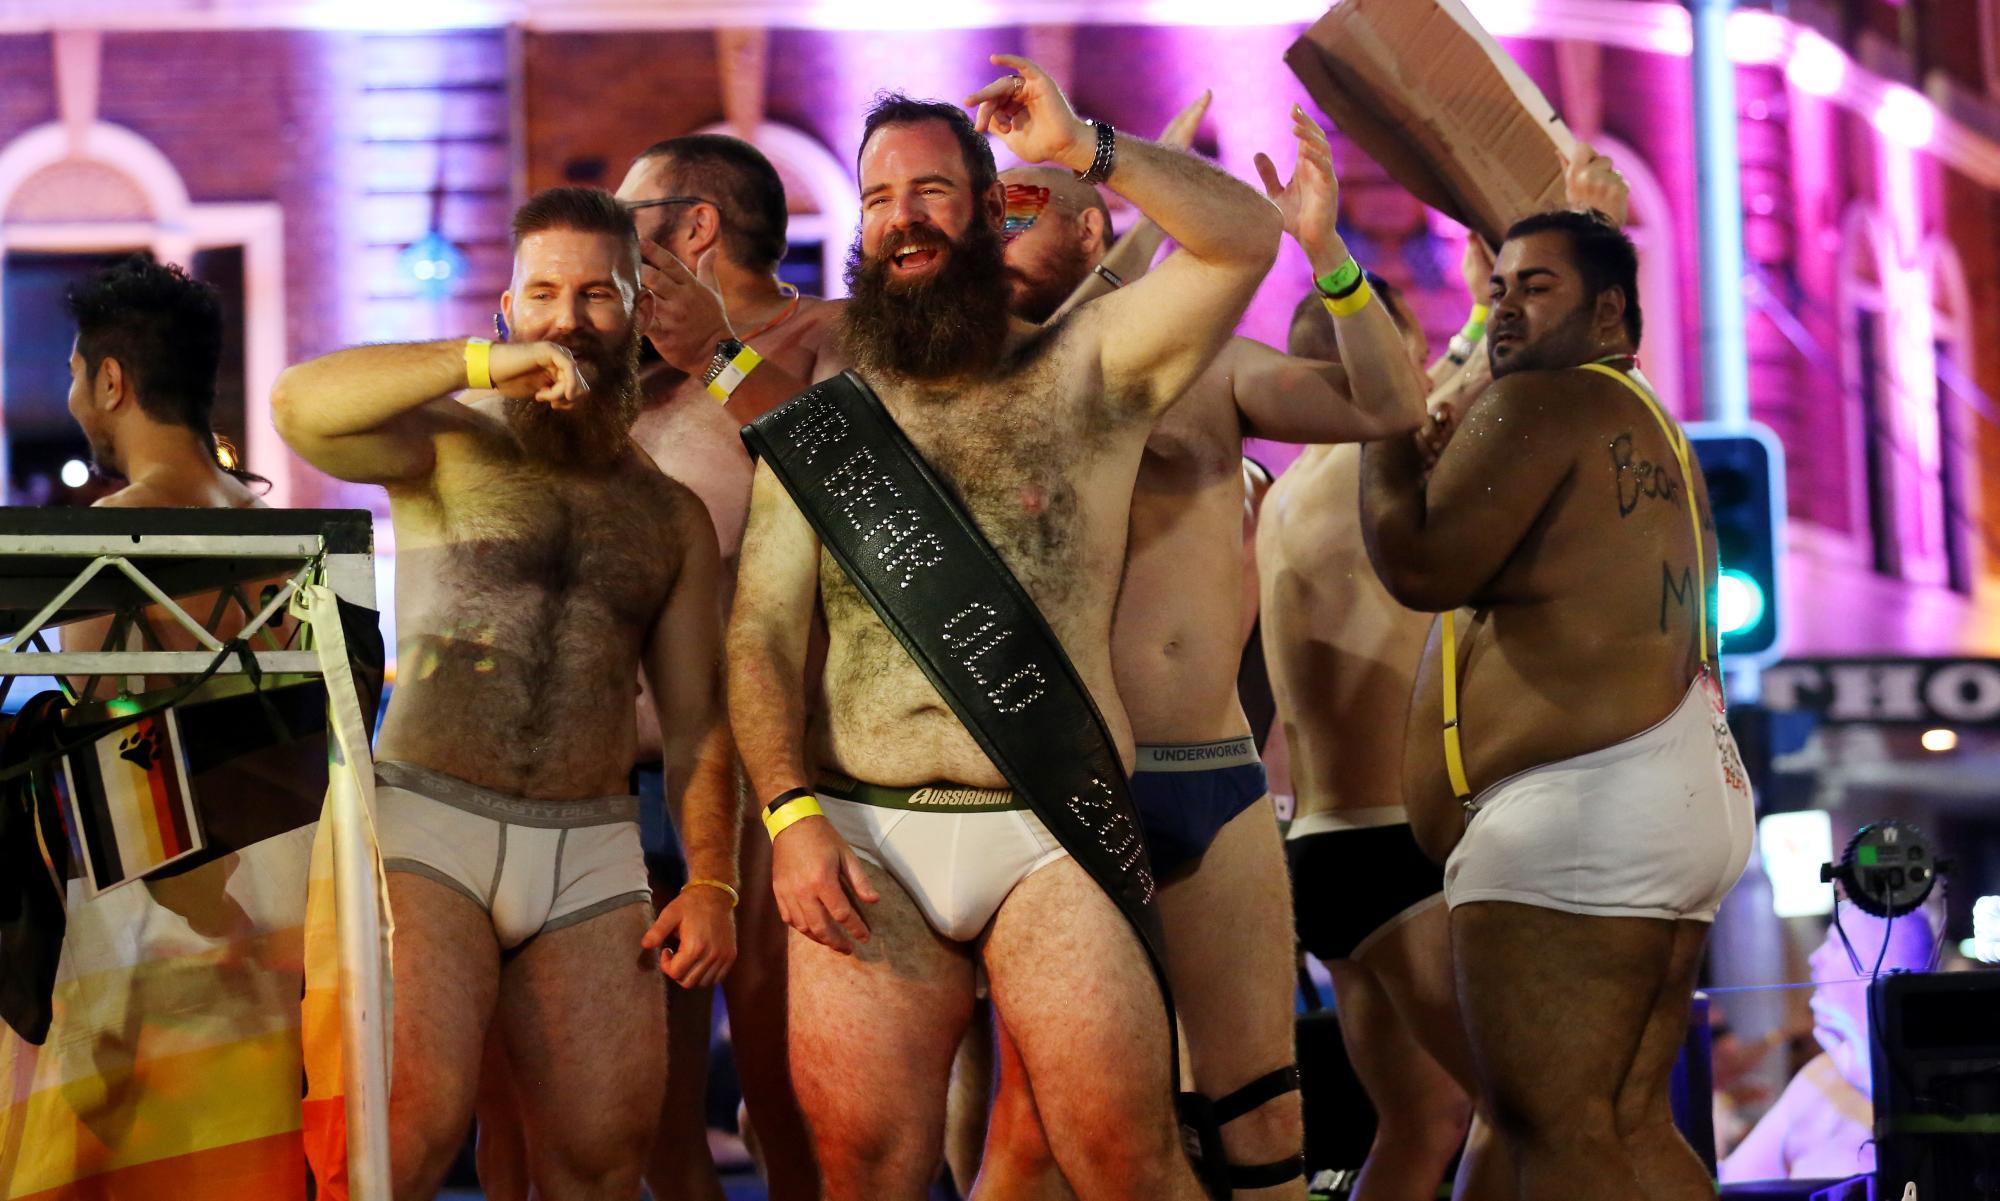 Quiet gay bar tampa